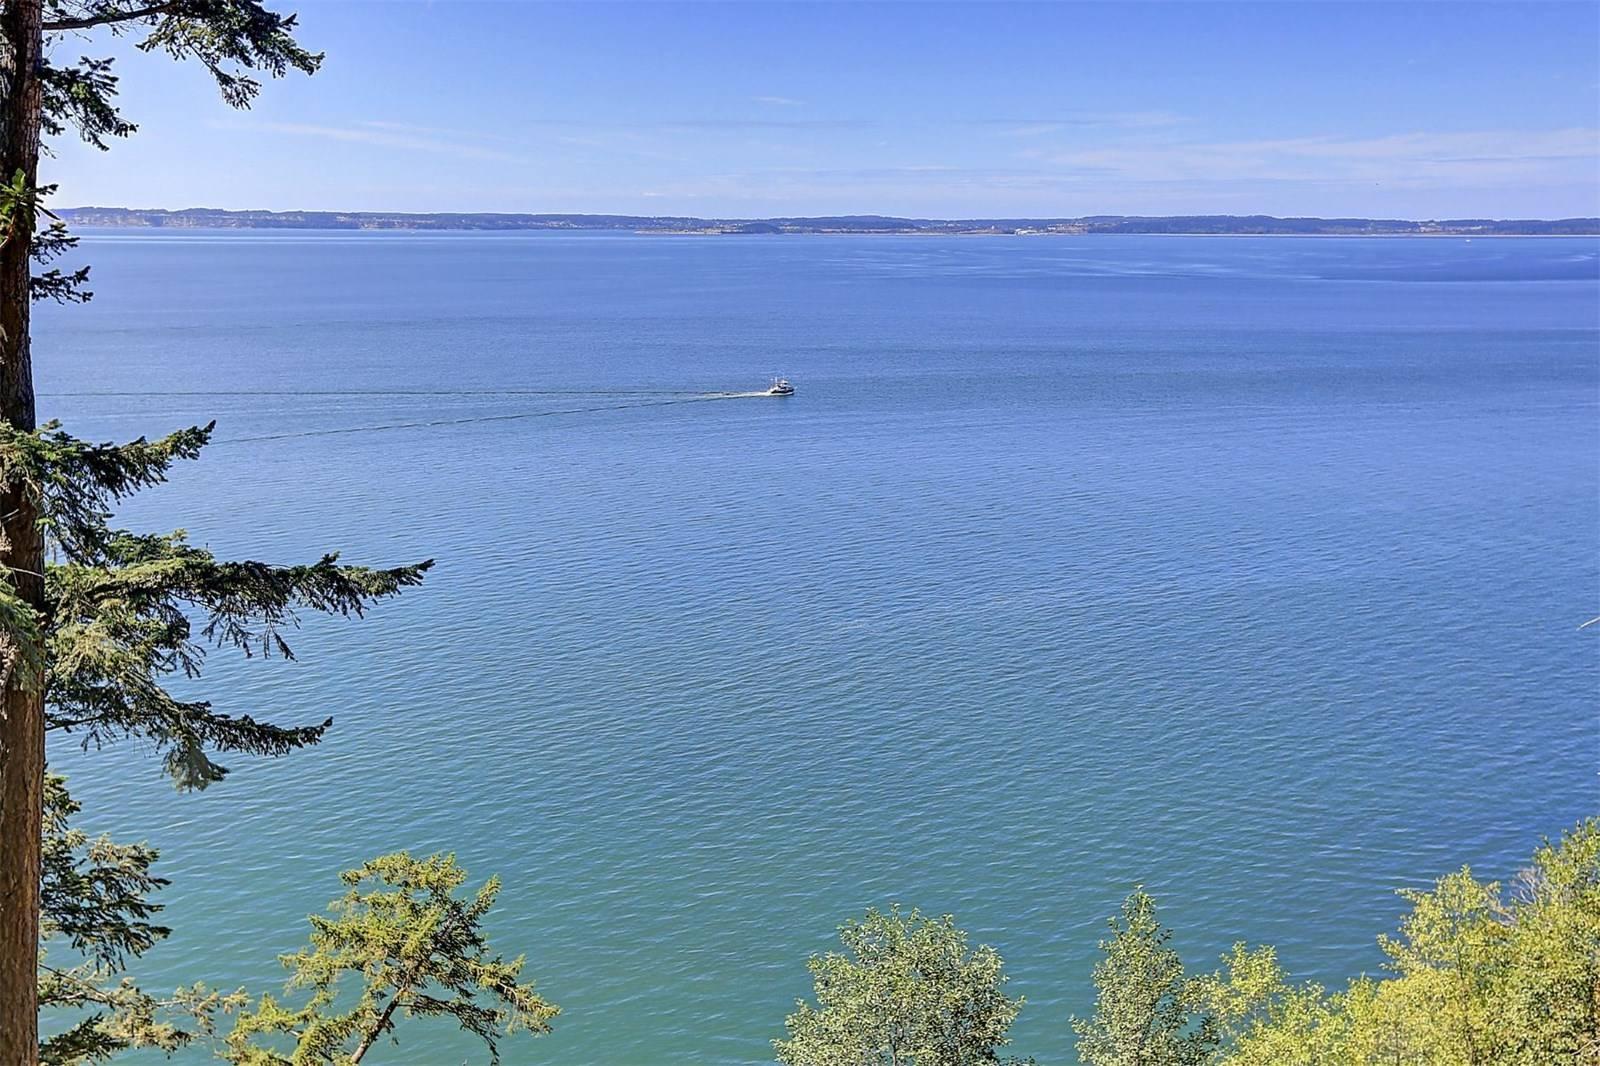 SAN JUAN ISLANDS - San Juan Island - Orcas Island - Lopez Island - Shaw Island -Blakely Island - Decatur Island - Waldron Island